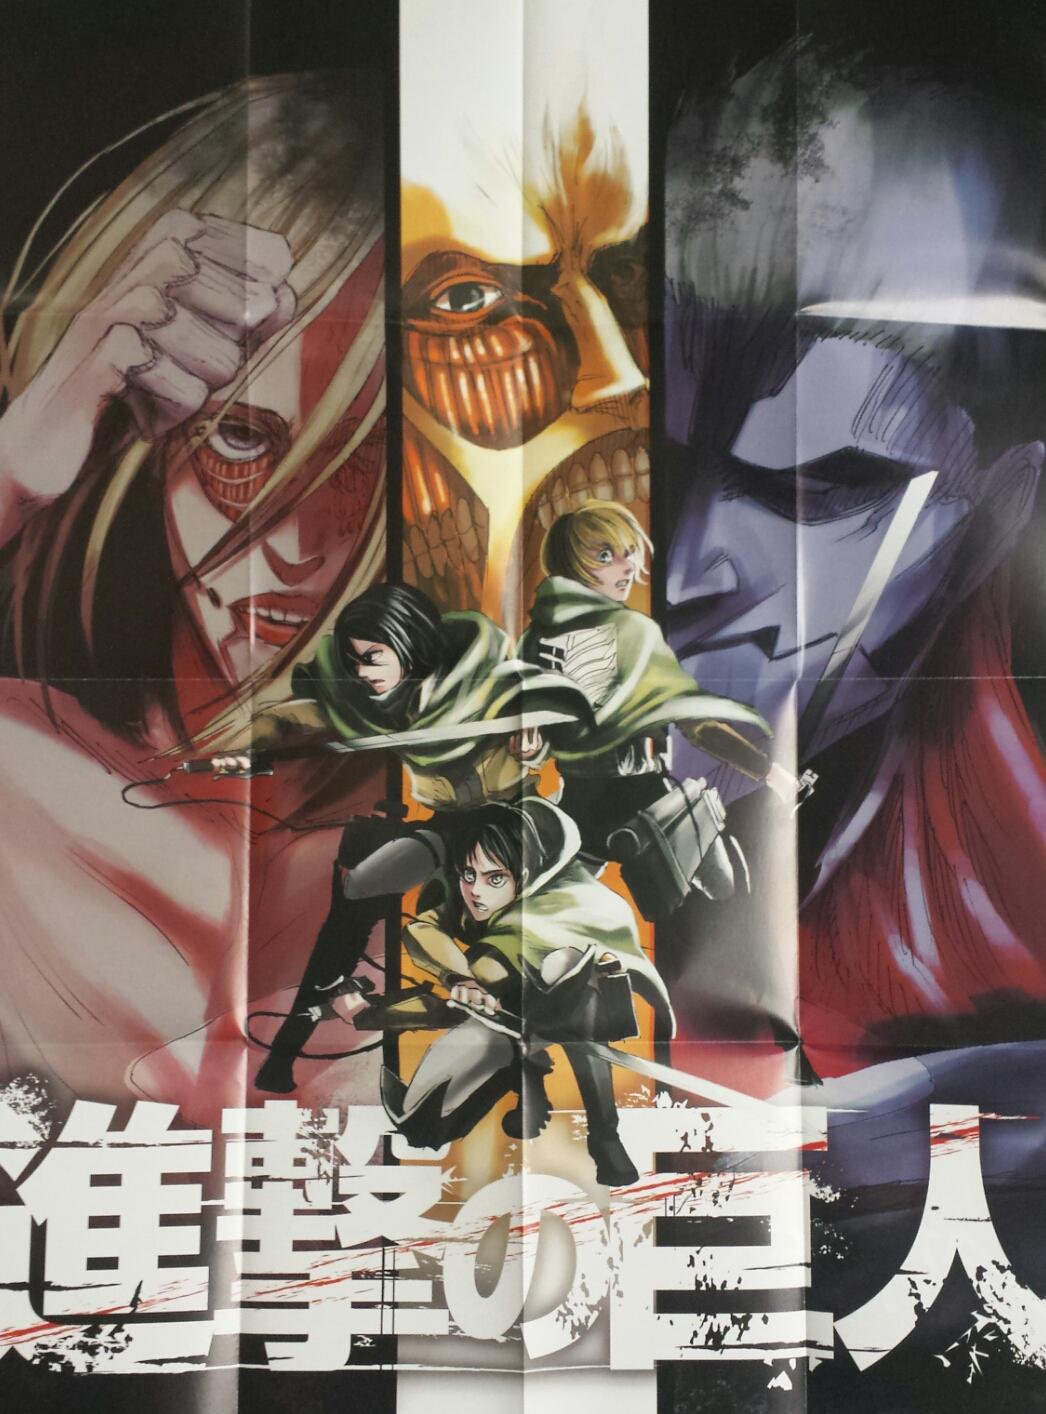 Awkward Dangos: Manga Update #4 - Oktober 2015